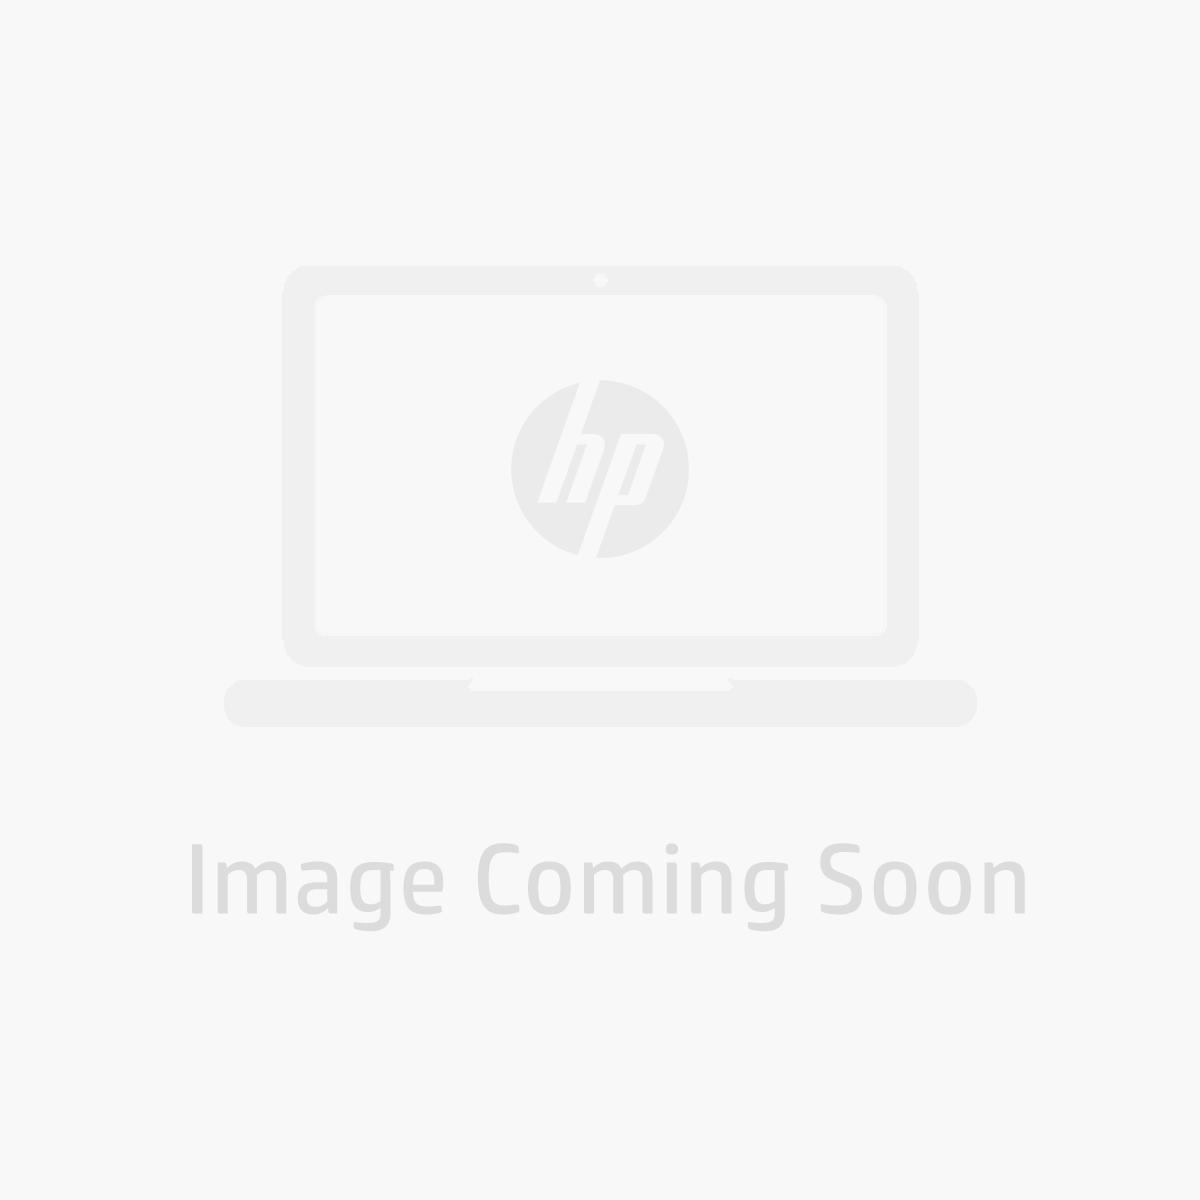 HP Pavilion AIO 23.8'' i7-9700T 8GB 1TB